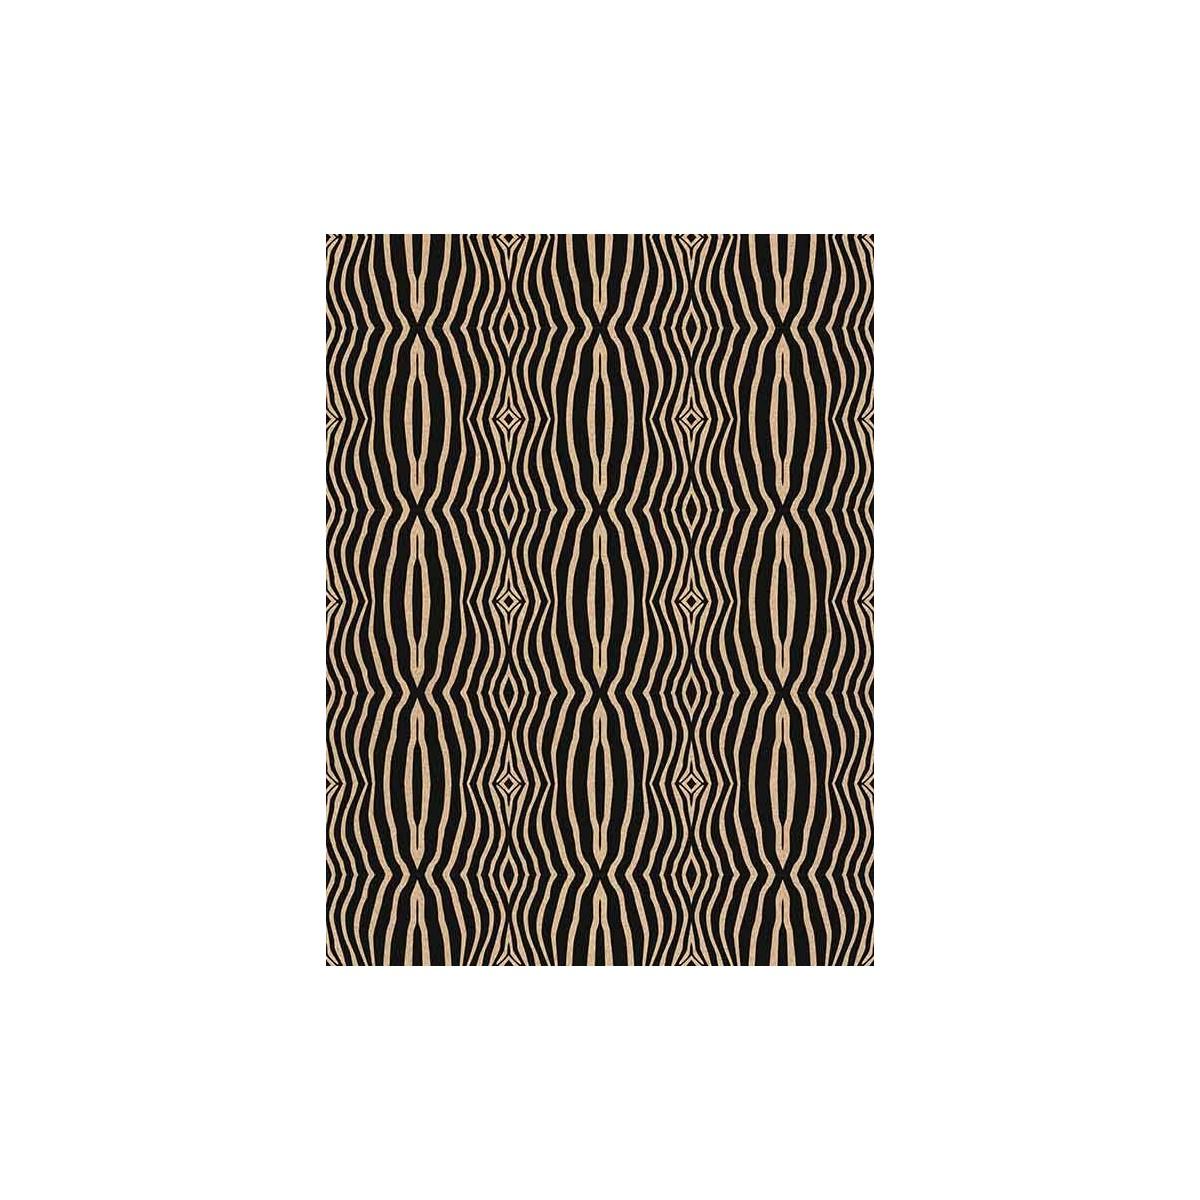 Cork fabric Technical Patterns - Zebra Home